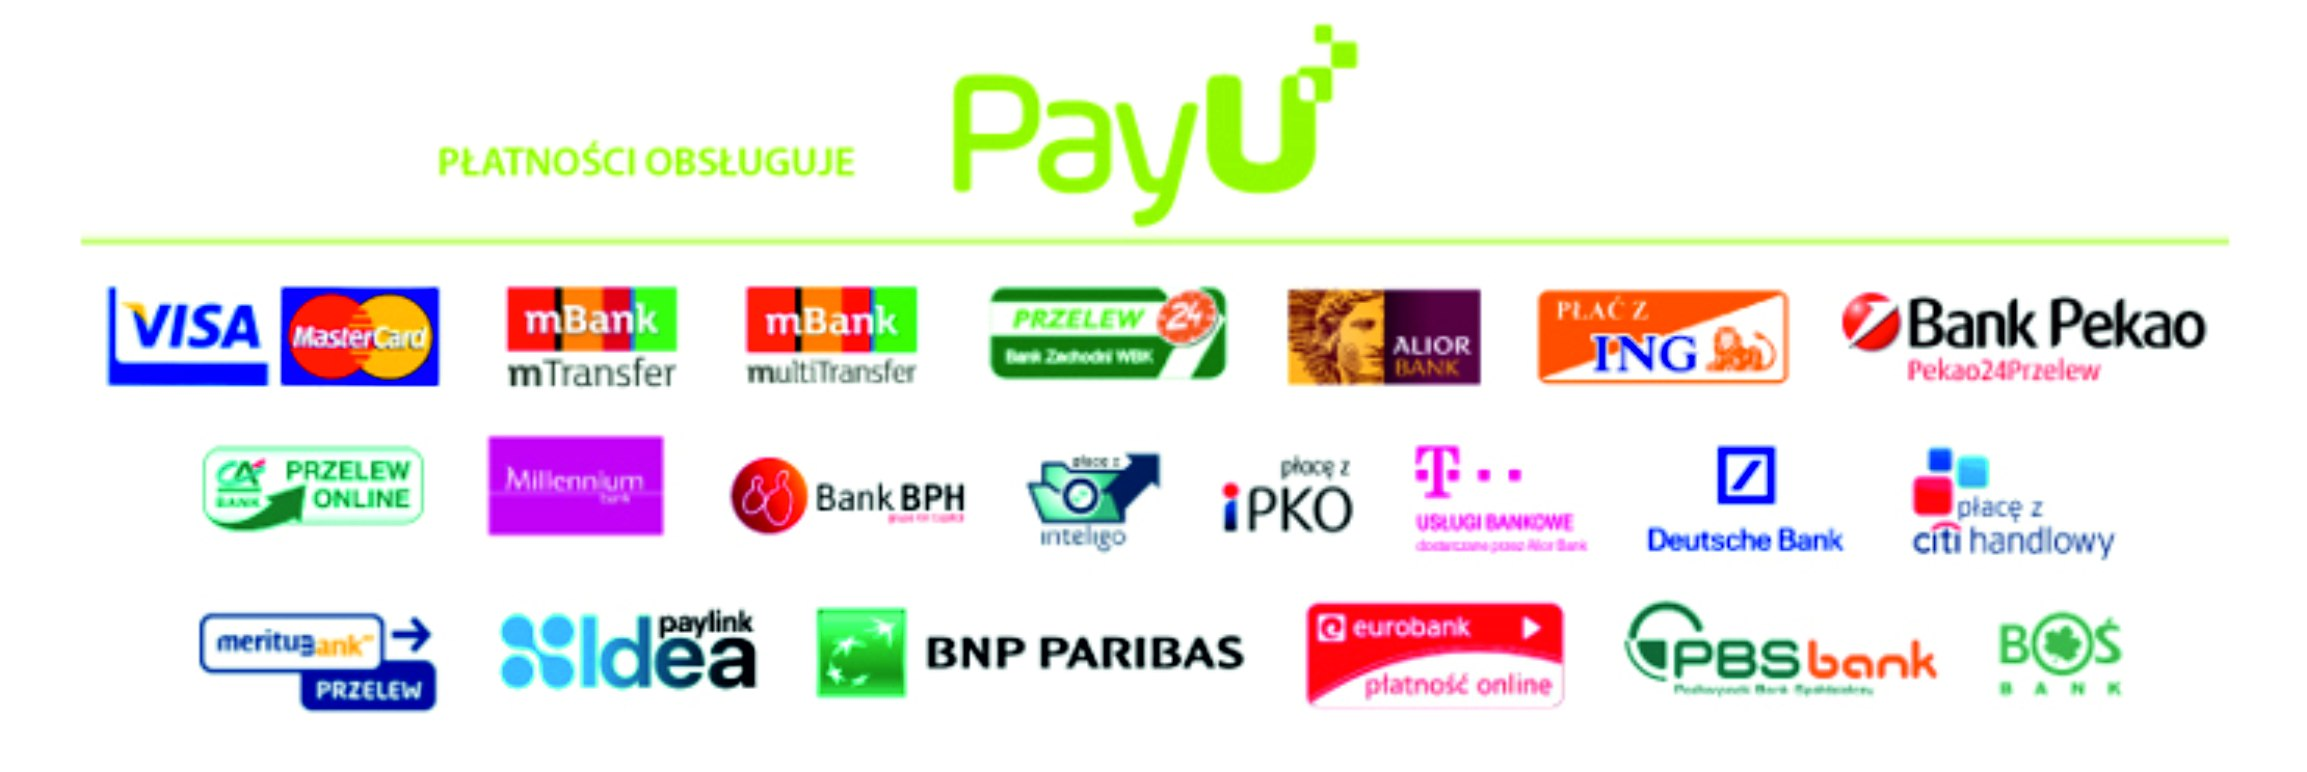 logo_platnosci_PAYU.jpg